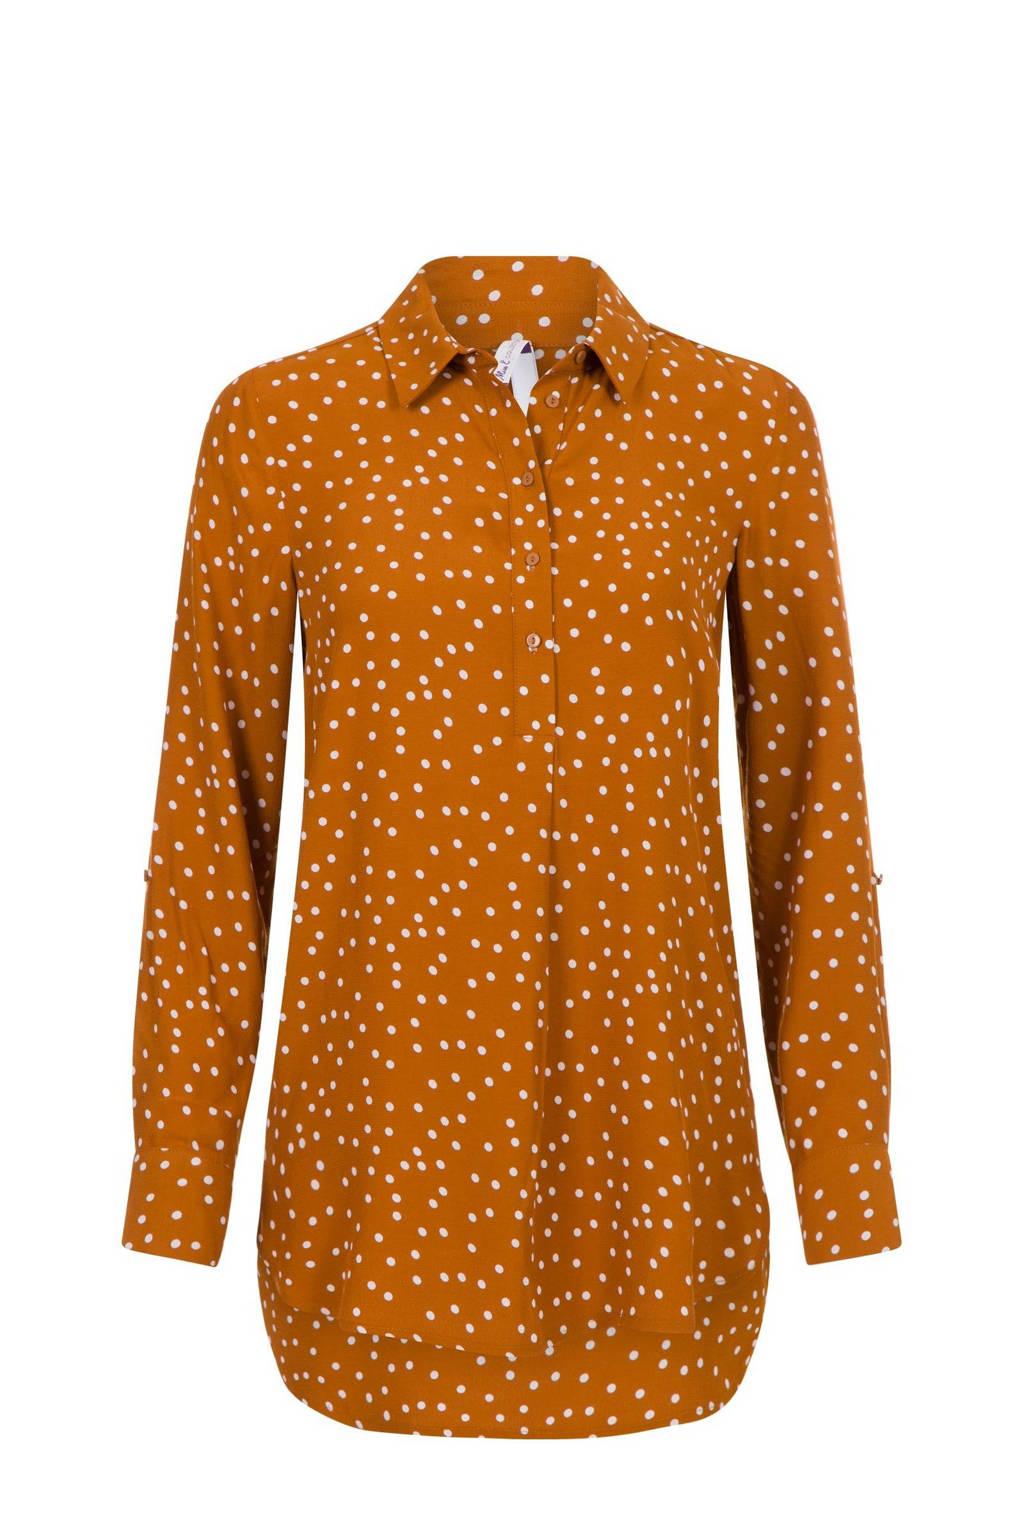 Miss Etam Regulier blouse met stippen bruin, Bruin